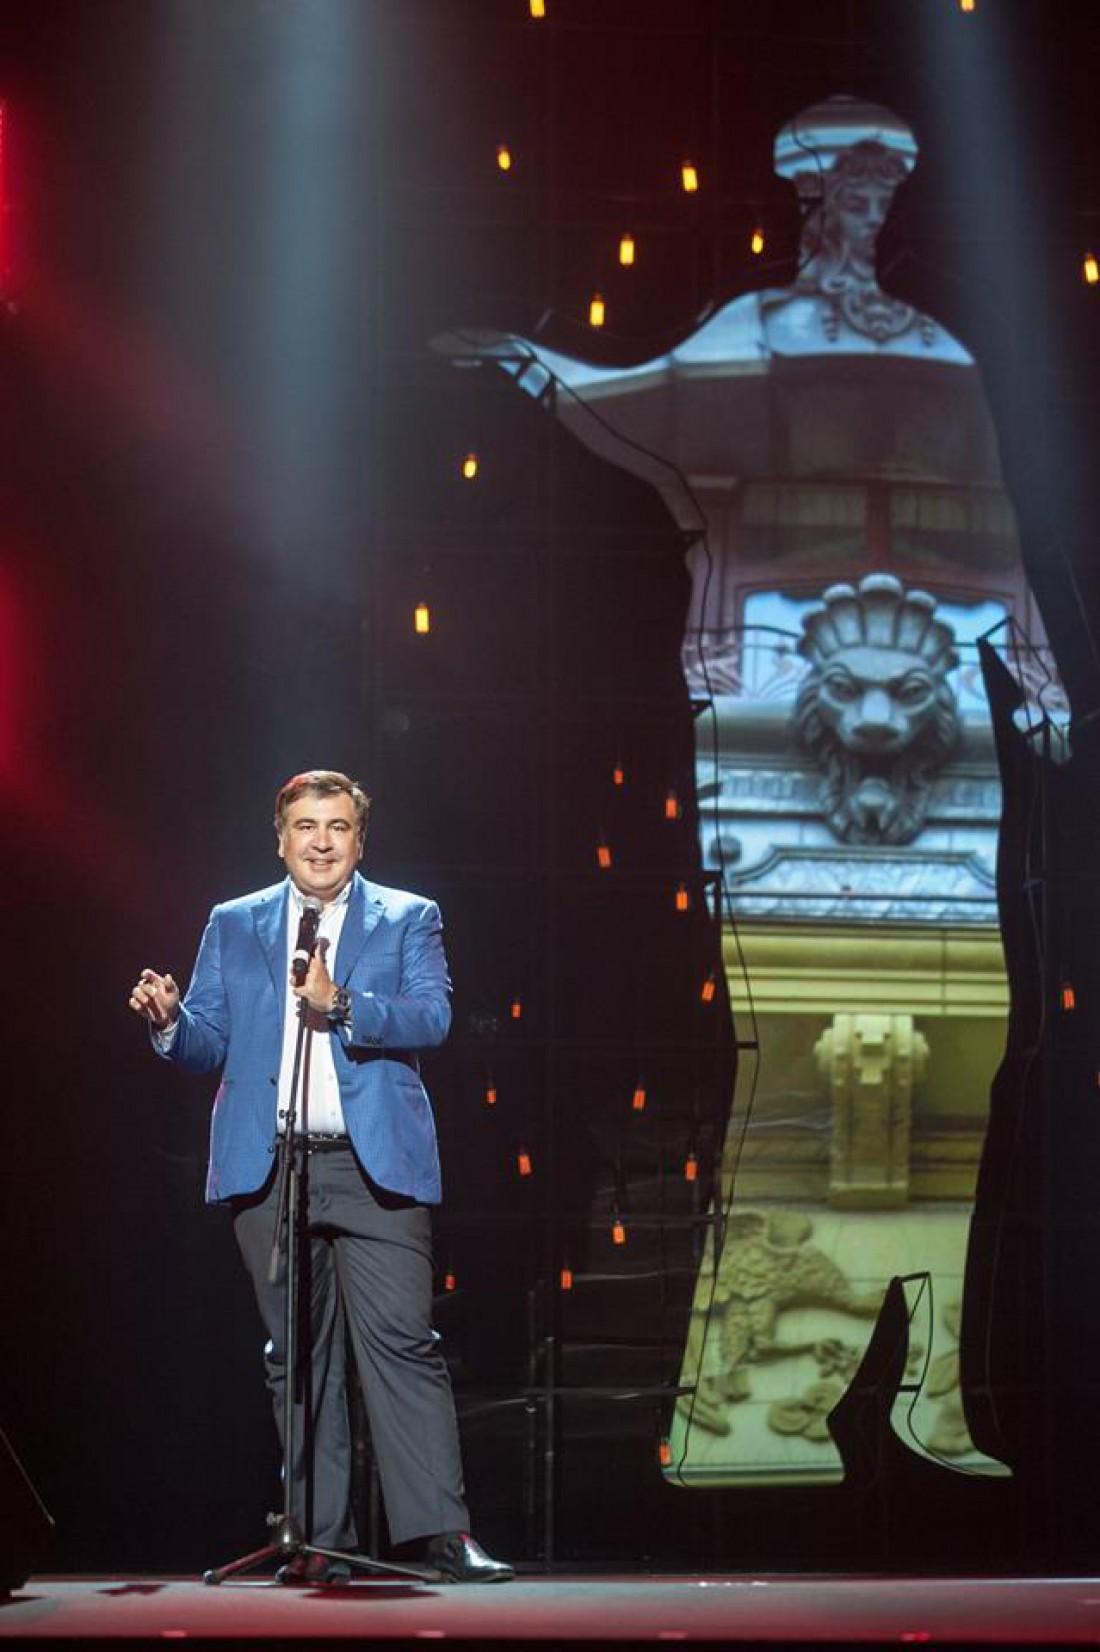 Церемония открытия ОМКФ 2016: Михаил Саакашвили